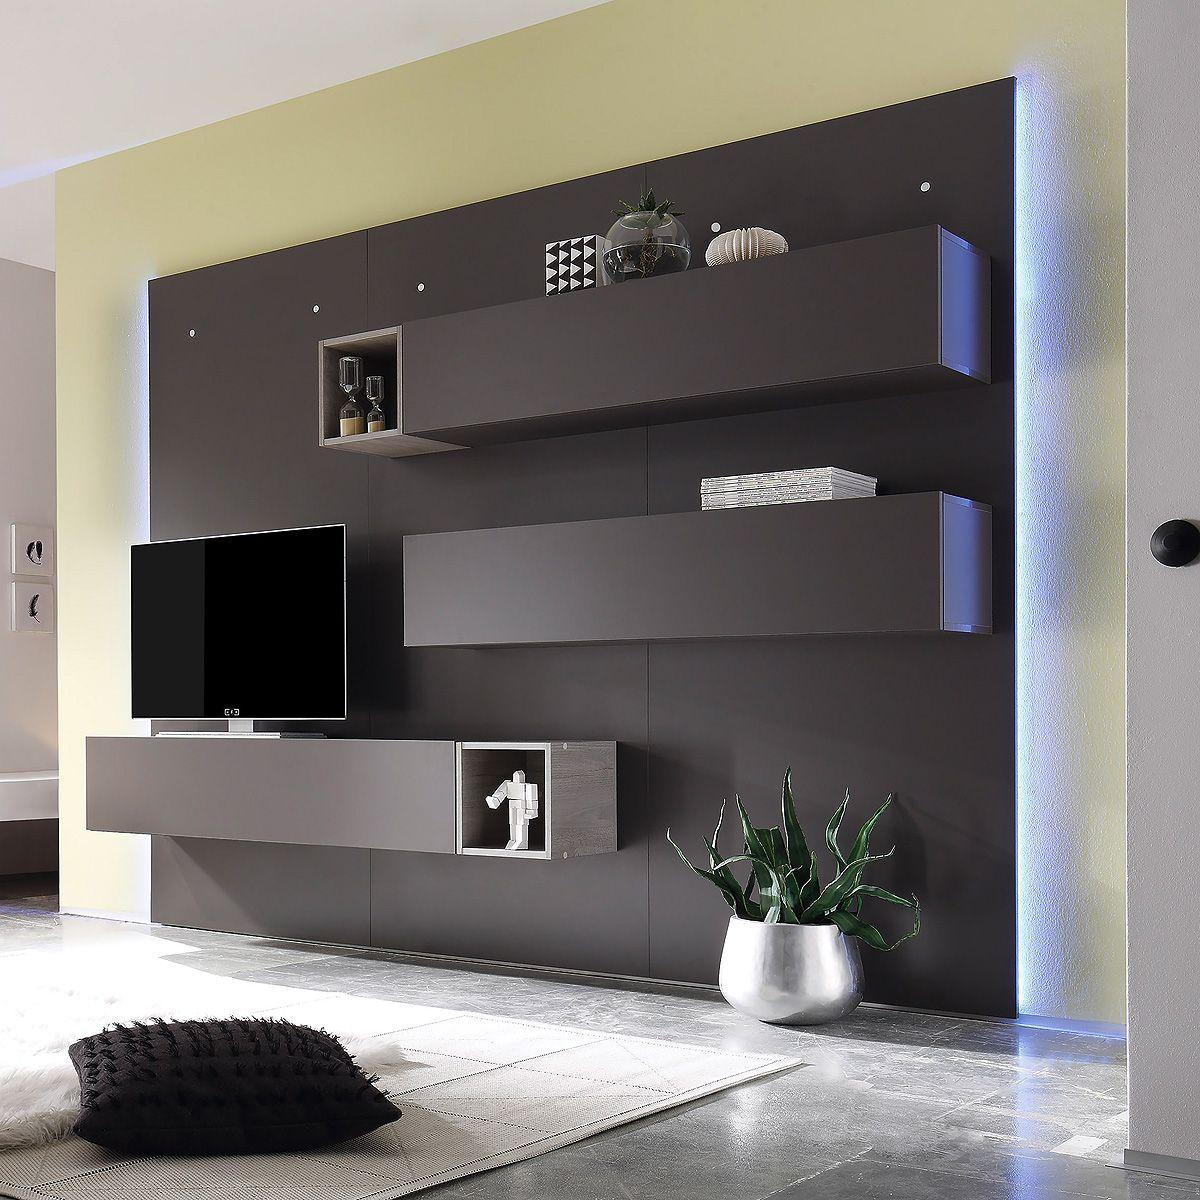 Ebay Angebot Wohnwand Cube 2 Kombi 2 Anbauwand Wohnkombi In Dunkel Grau Matt Und Eicheihr Q Living Room Decor Apartment Entertainment Room Decor Tv Wall Design